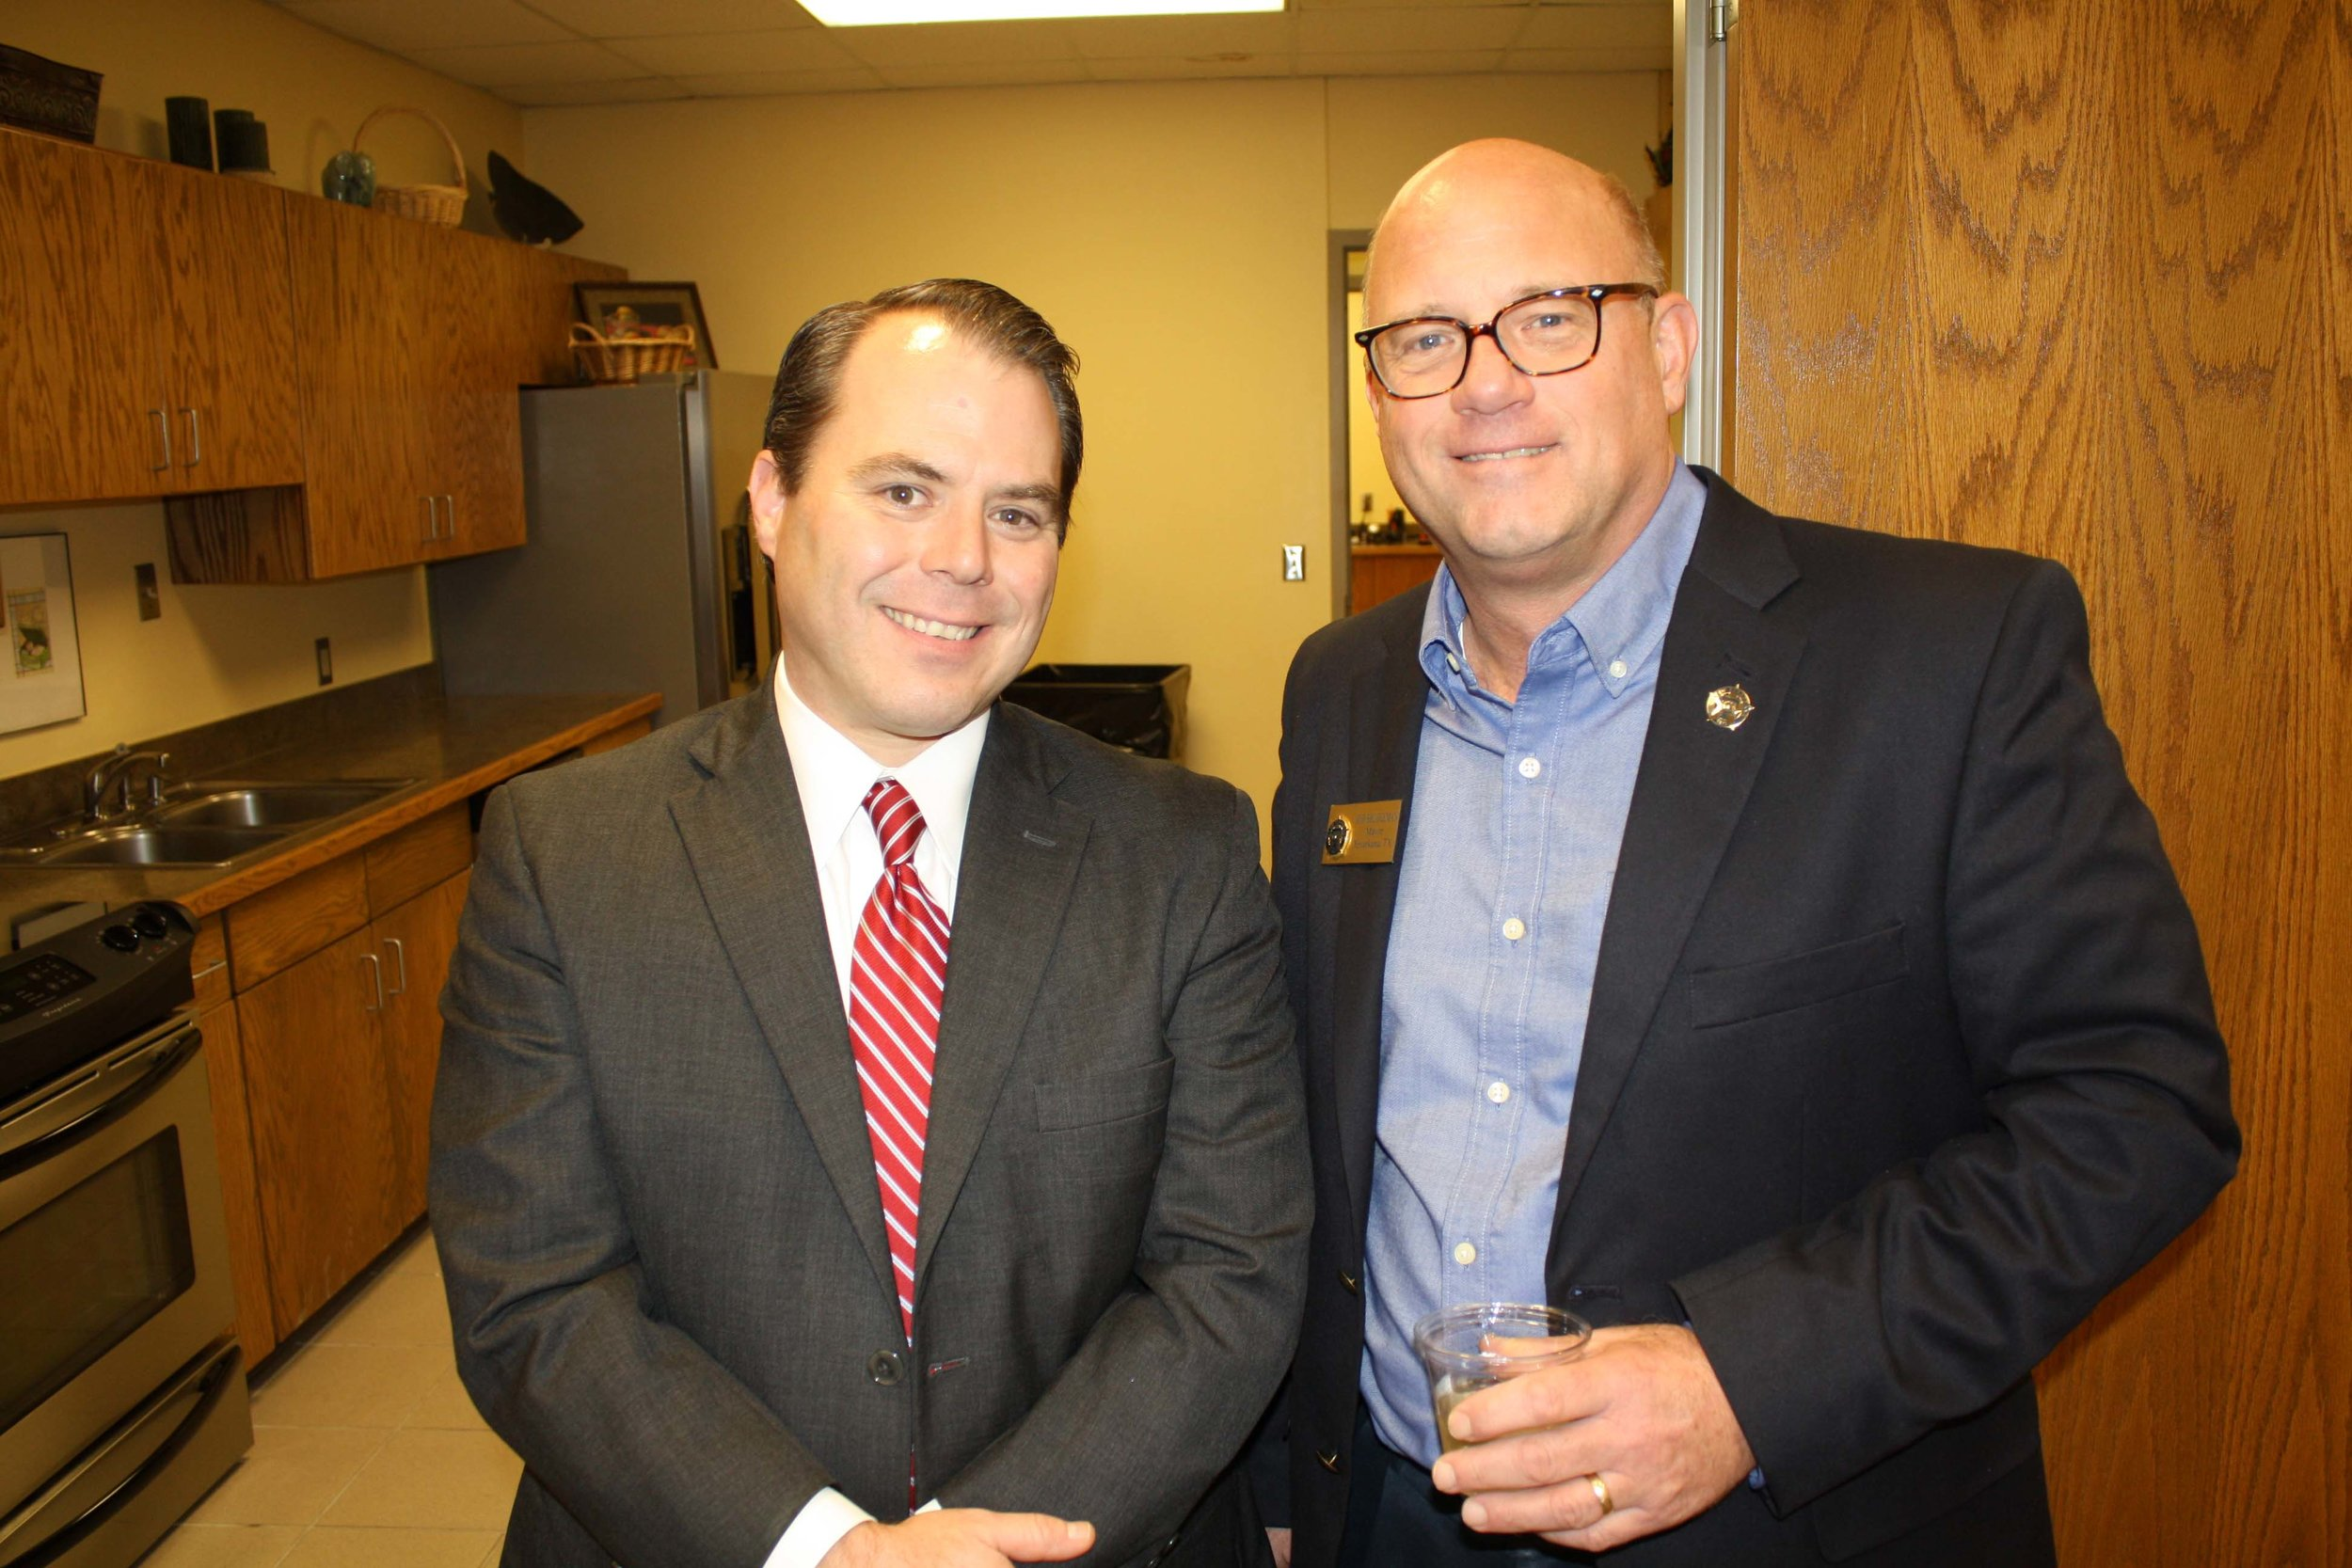 Fred Meisenheimer and Mayor Bob Bruggeman